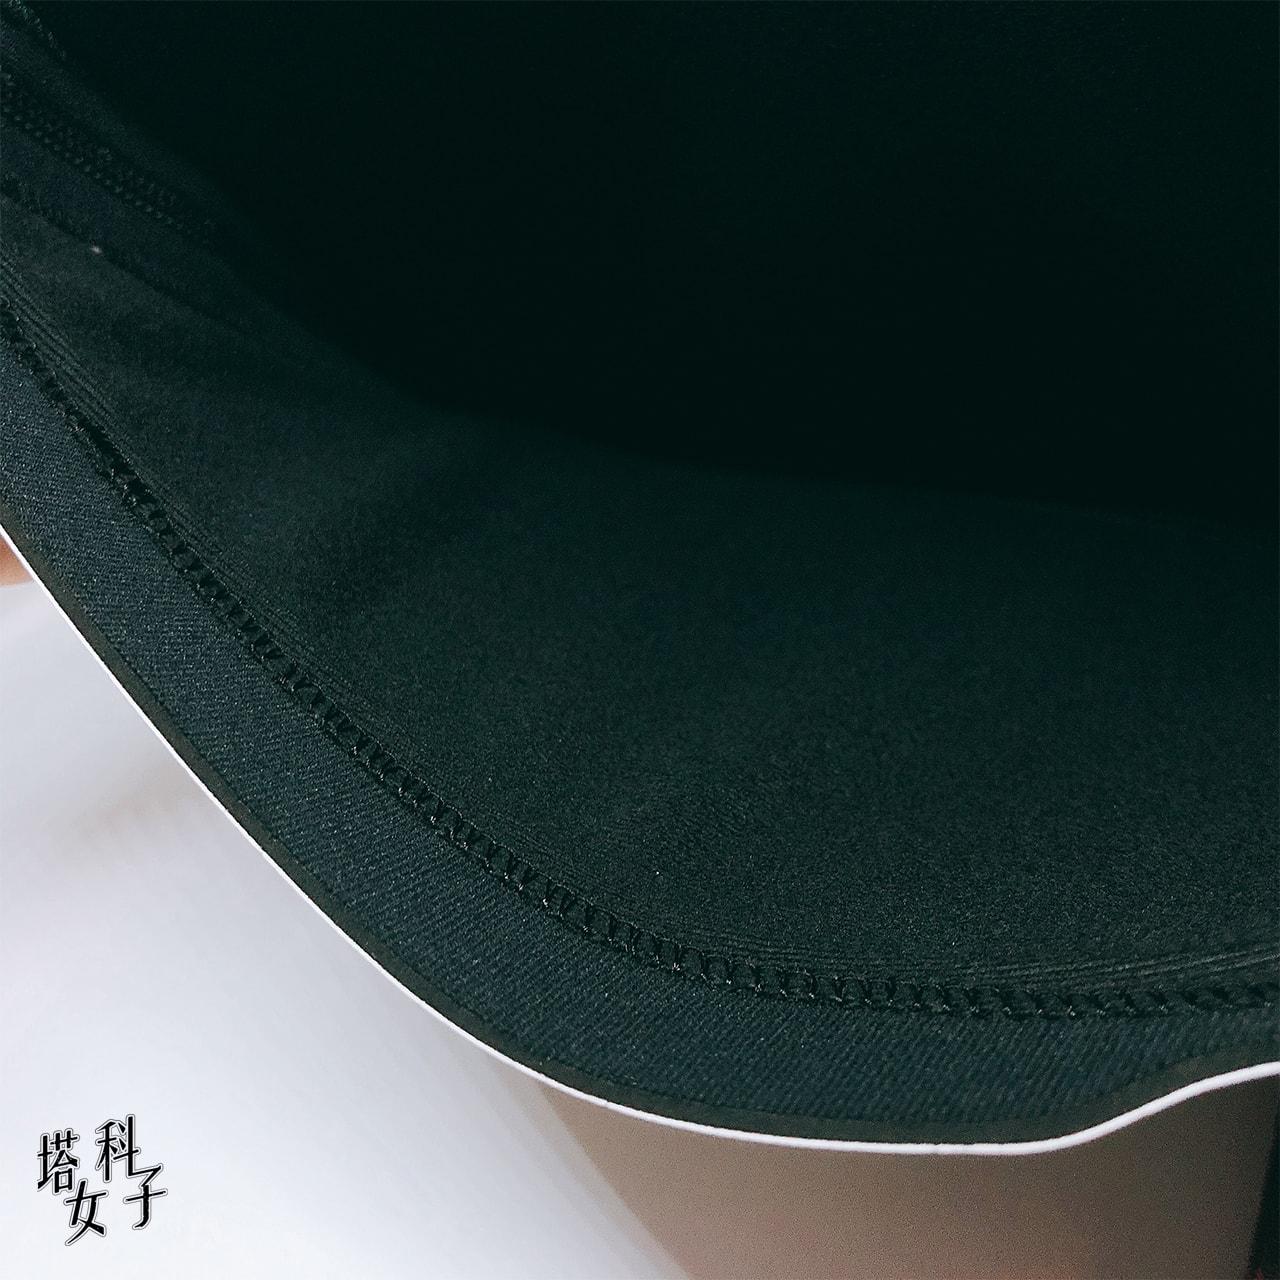 Acme Made - Skinny Sleeve 內裡